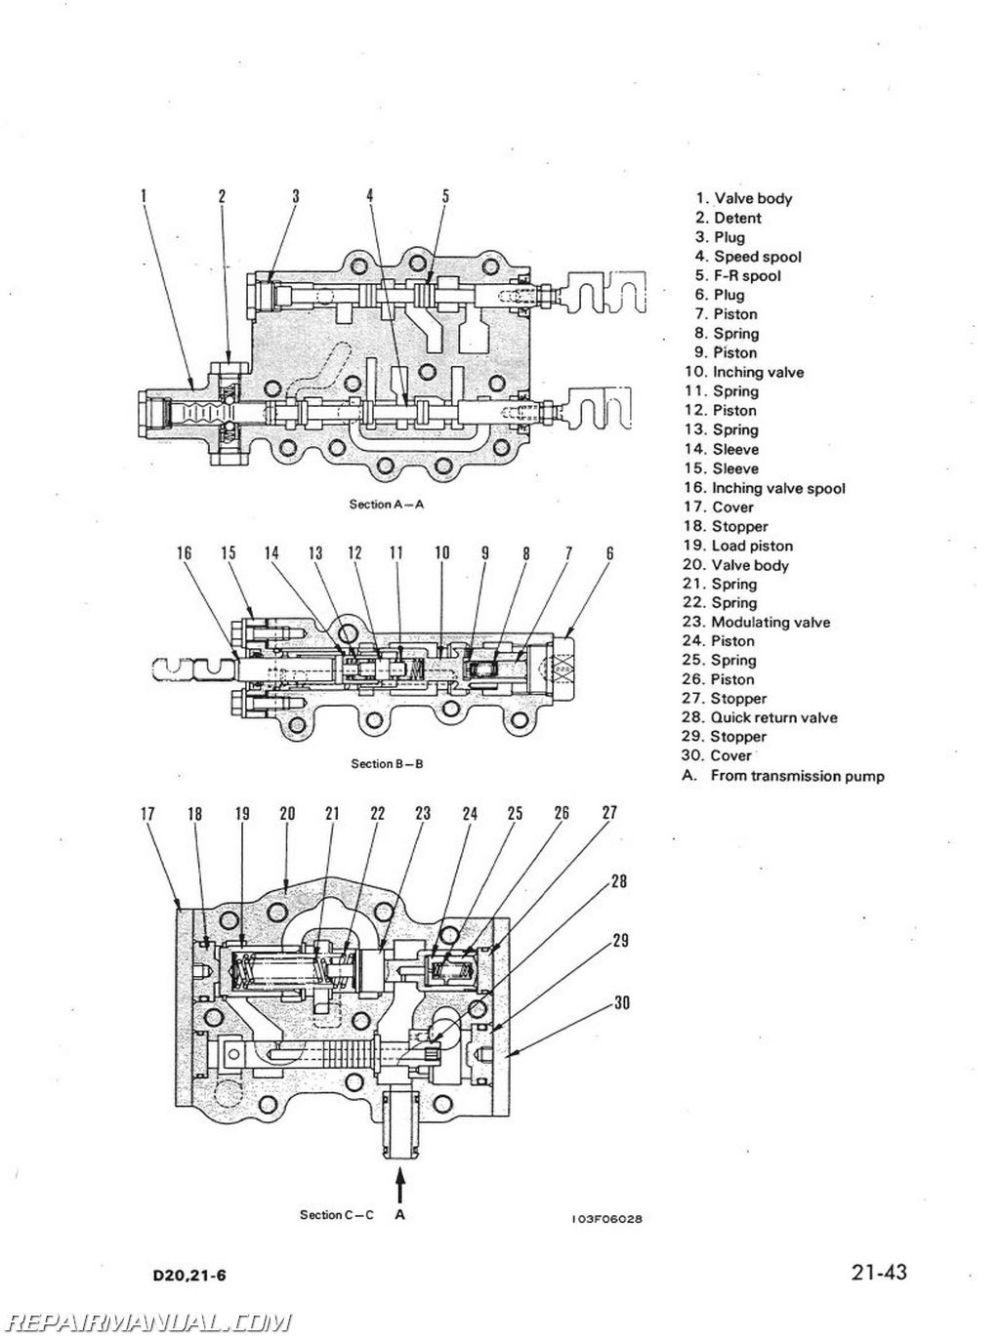 medium resolution of komatsu d31p wiring diagram wiring diagram rh anynews co komatsu d31p 17 komatsu d31p parts